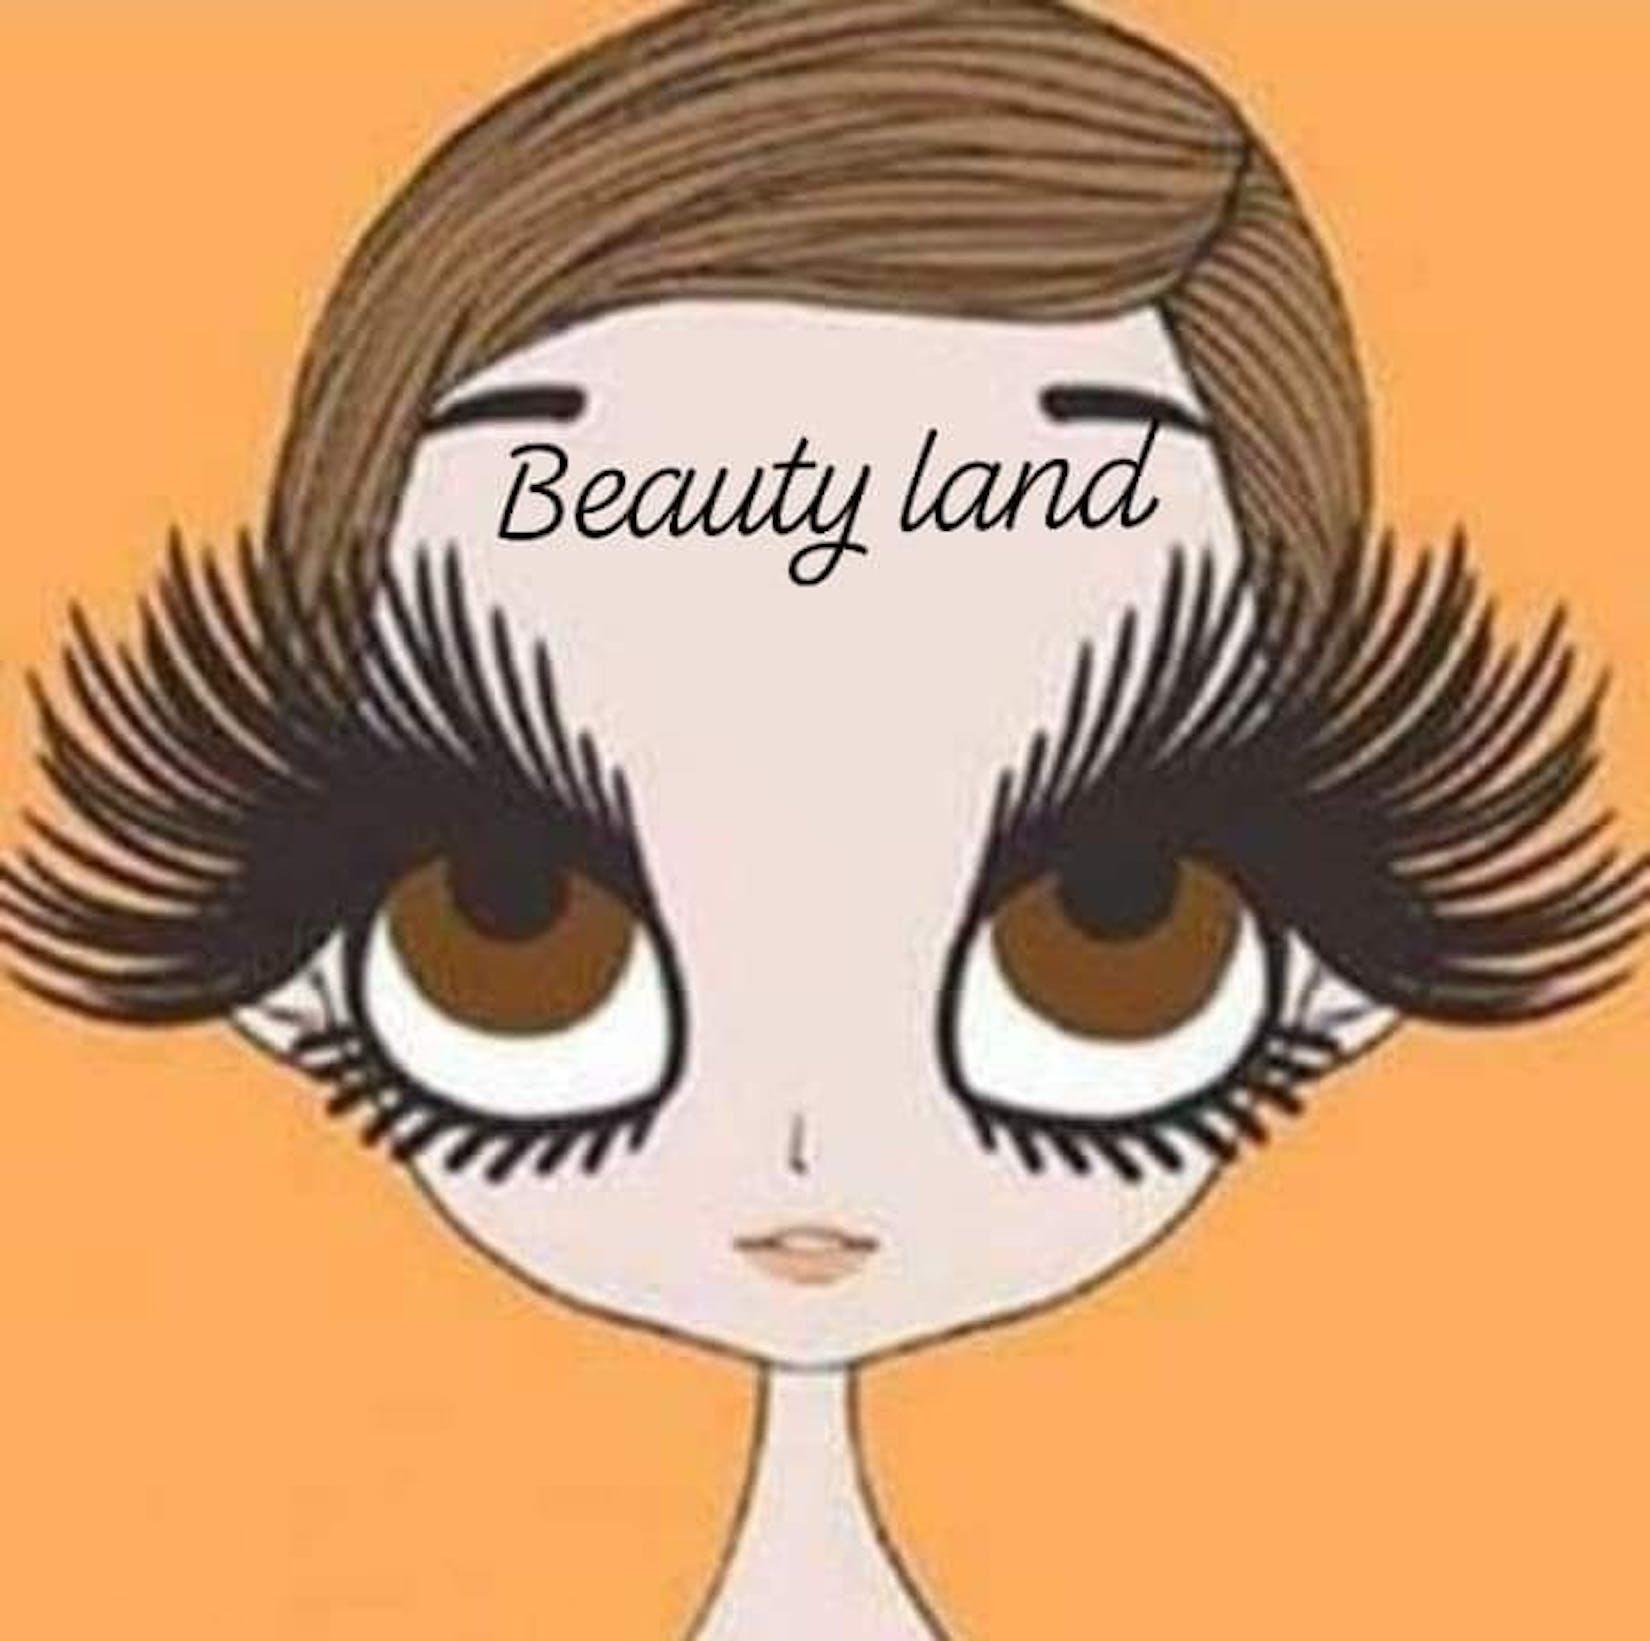 Beauty land | Beauty